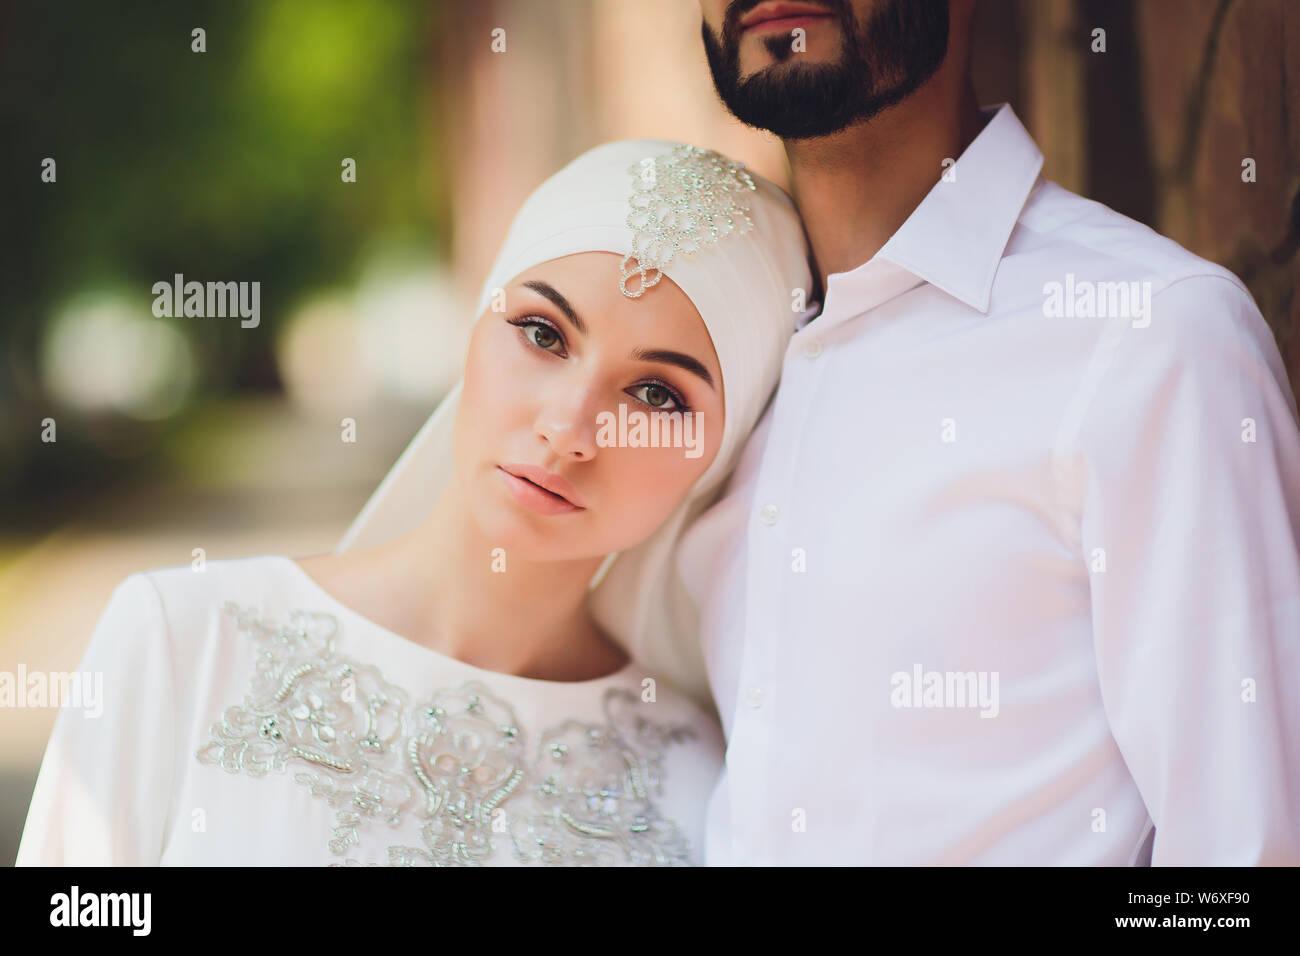 Royaume-Uni musulman datant mariage